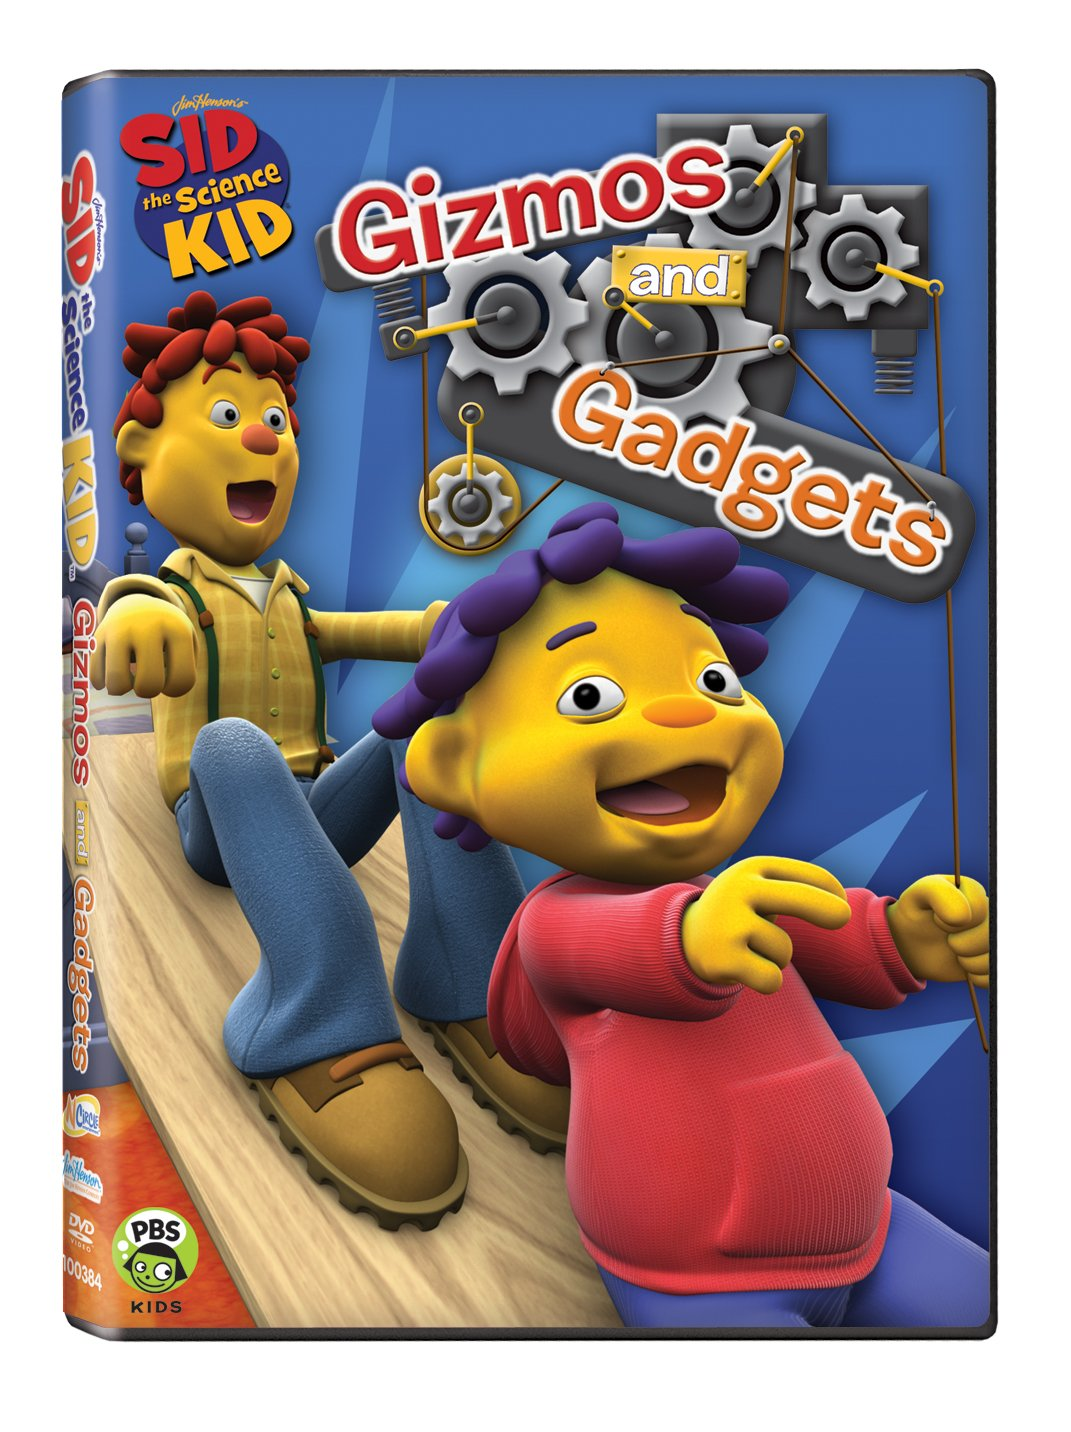 Sid The Science Kid Characters Names - vipdownloadimage